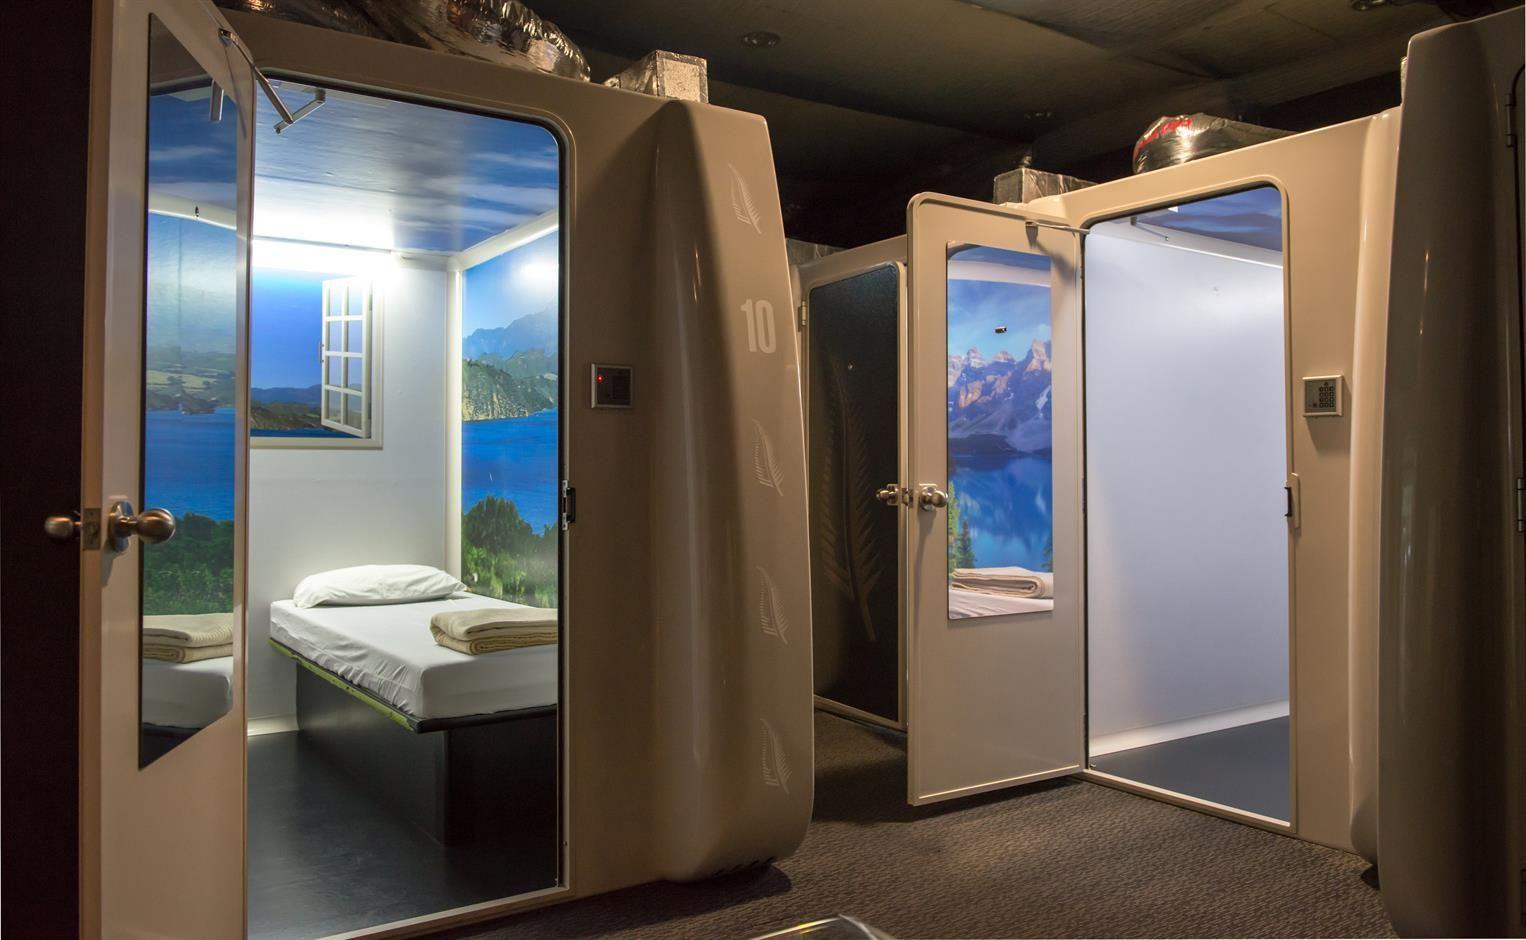 Кабинки для сна в аэропорте Дубай